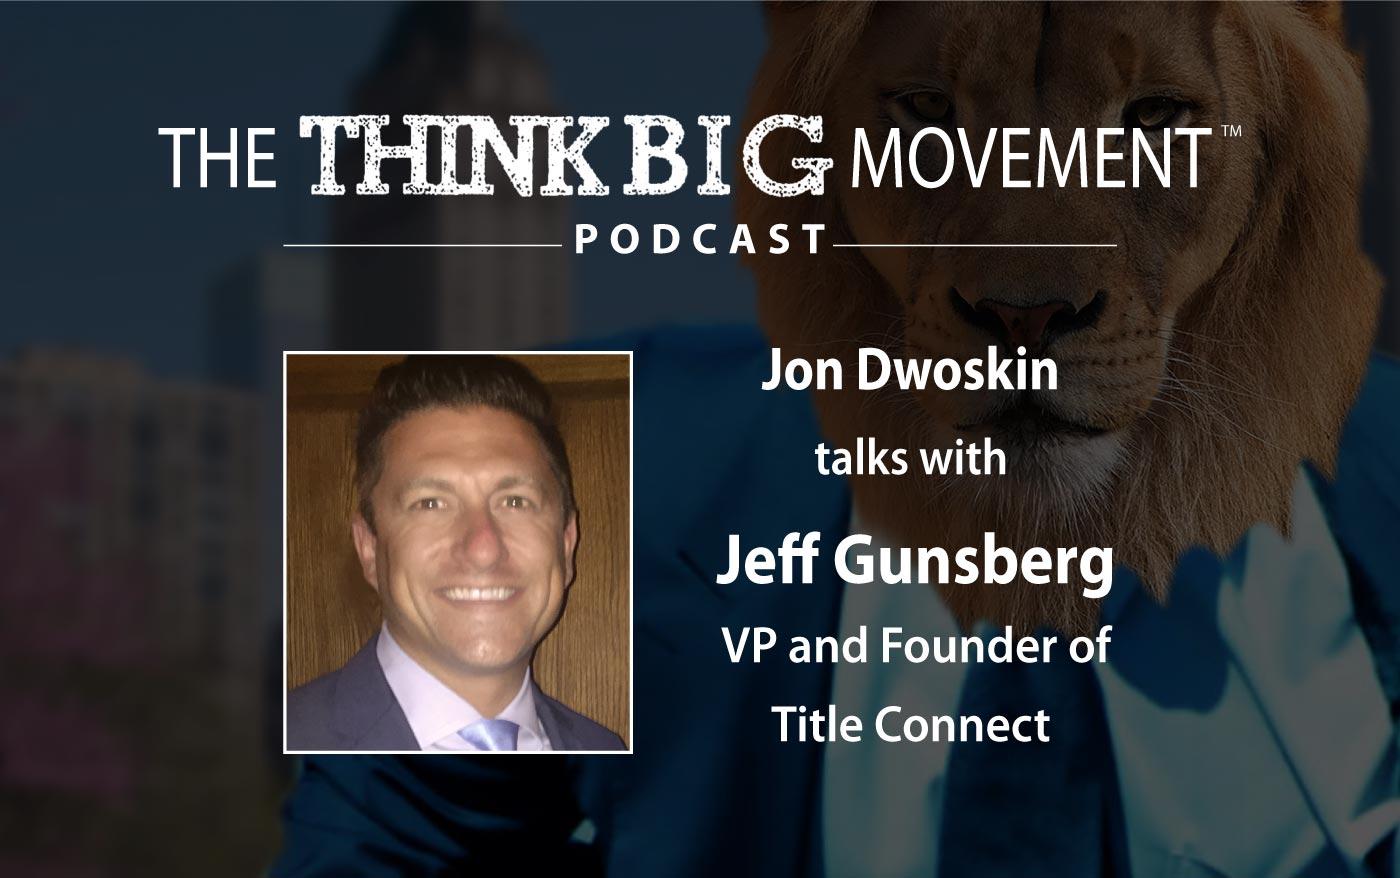 Think Big Movement Podcast - Jon Dwoskin Interviews Jeff Gunsberg